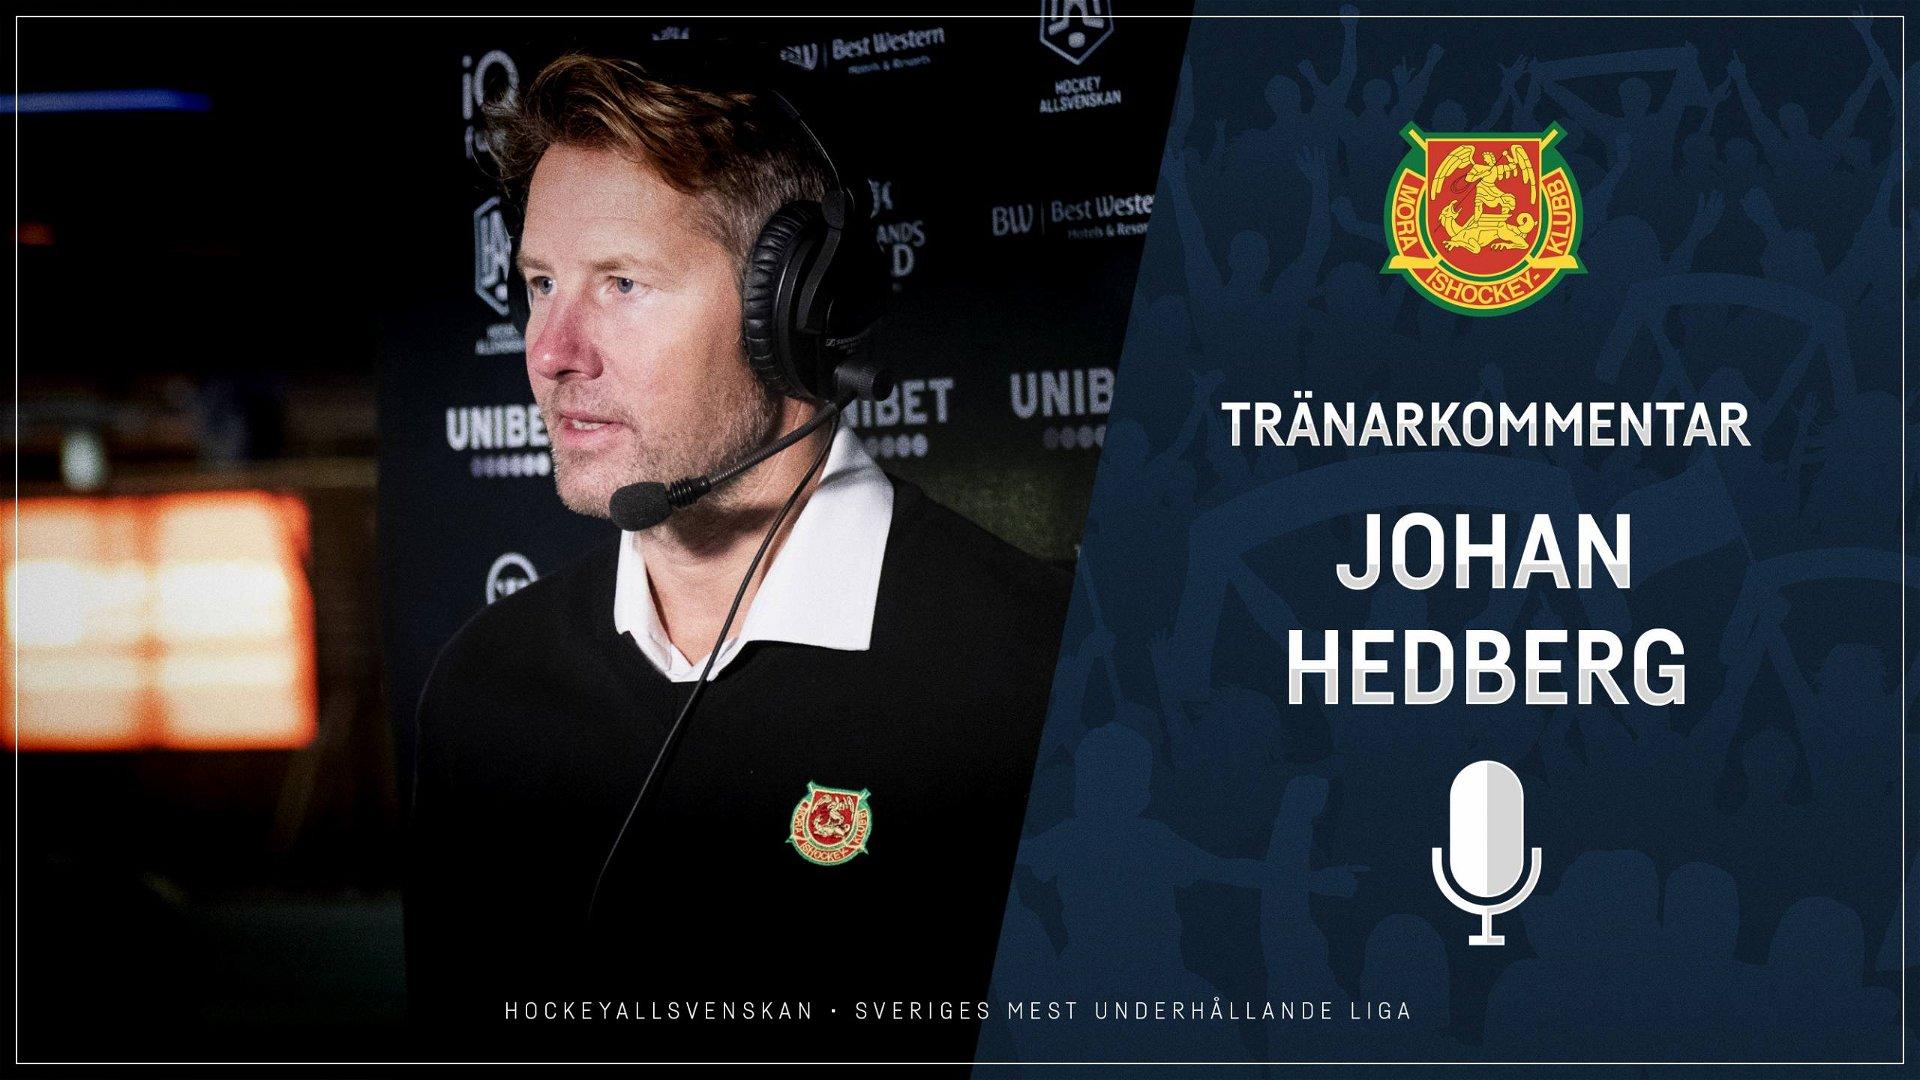 2021-01-17 Segerintervju: Johan Hedberg